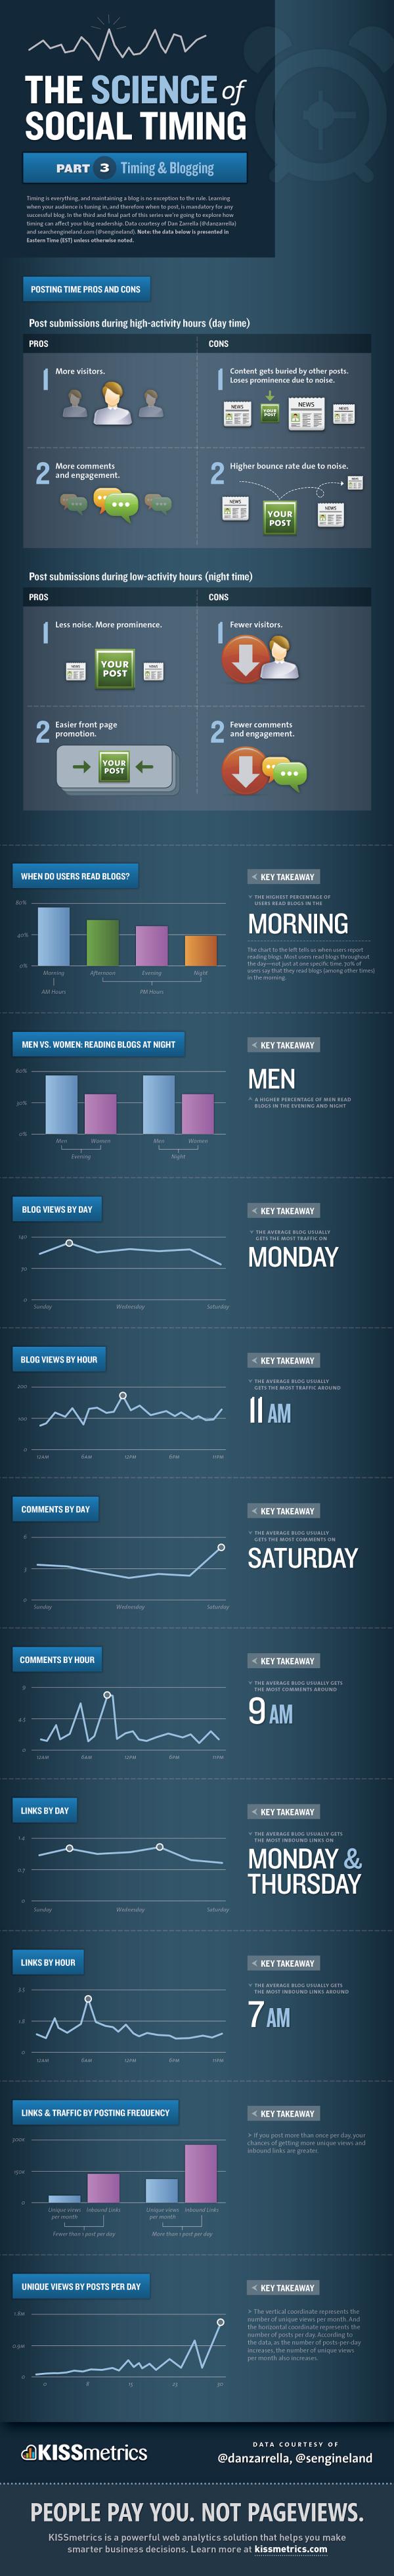 Social Timing & Blogging resized 600